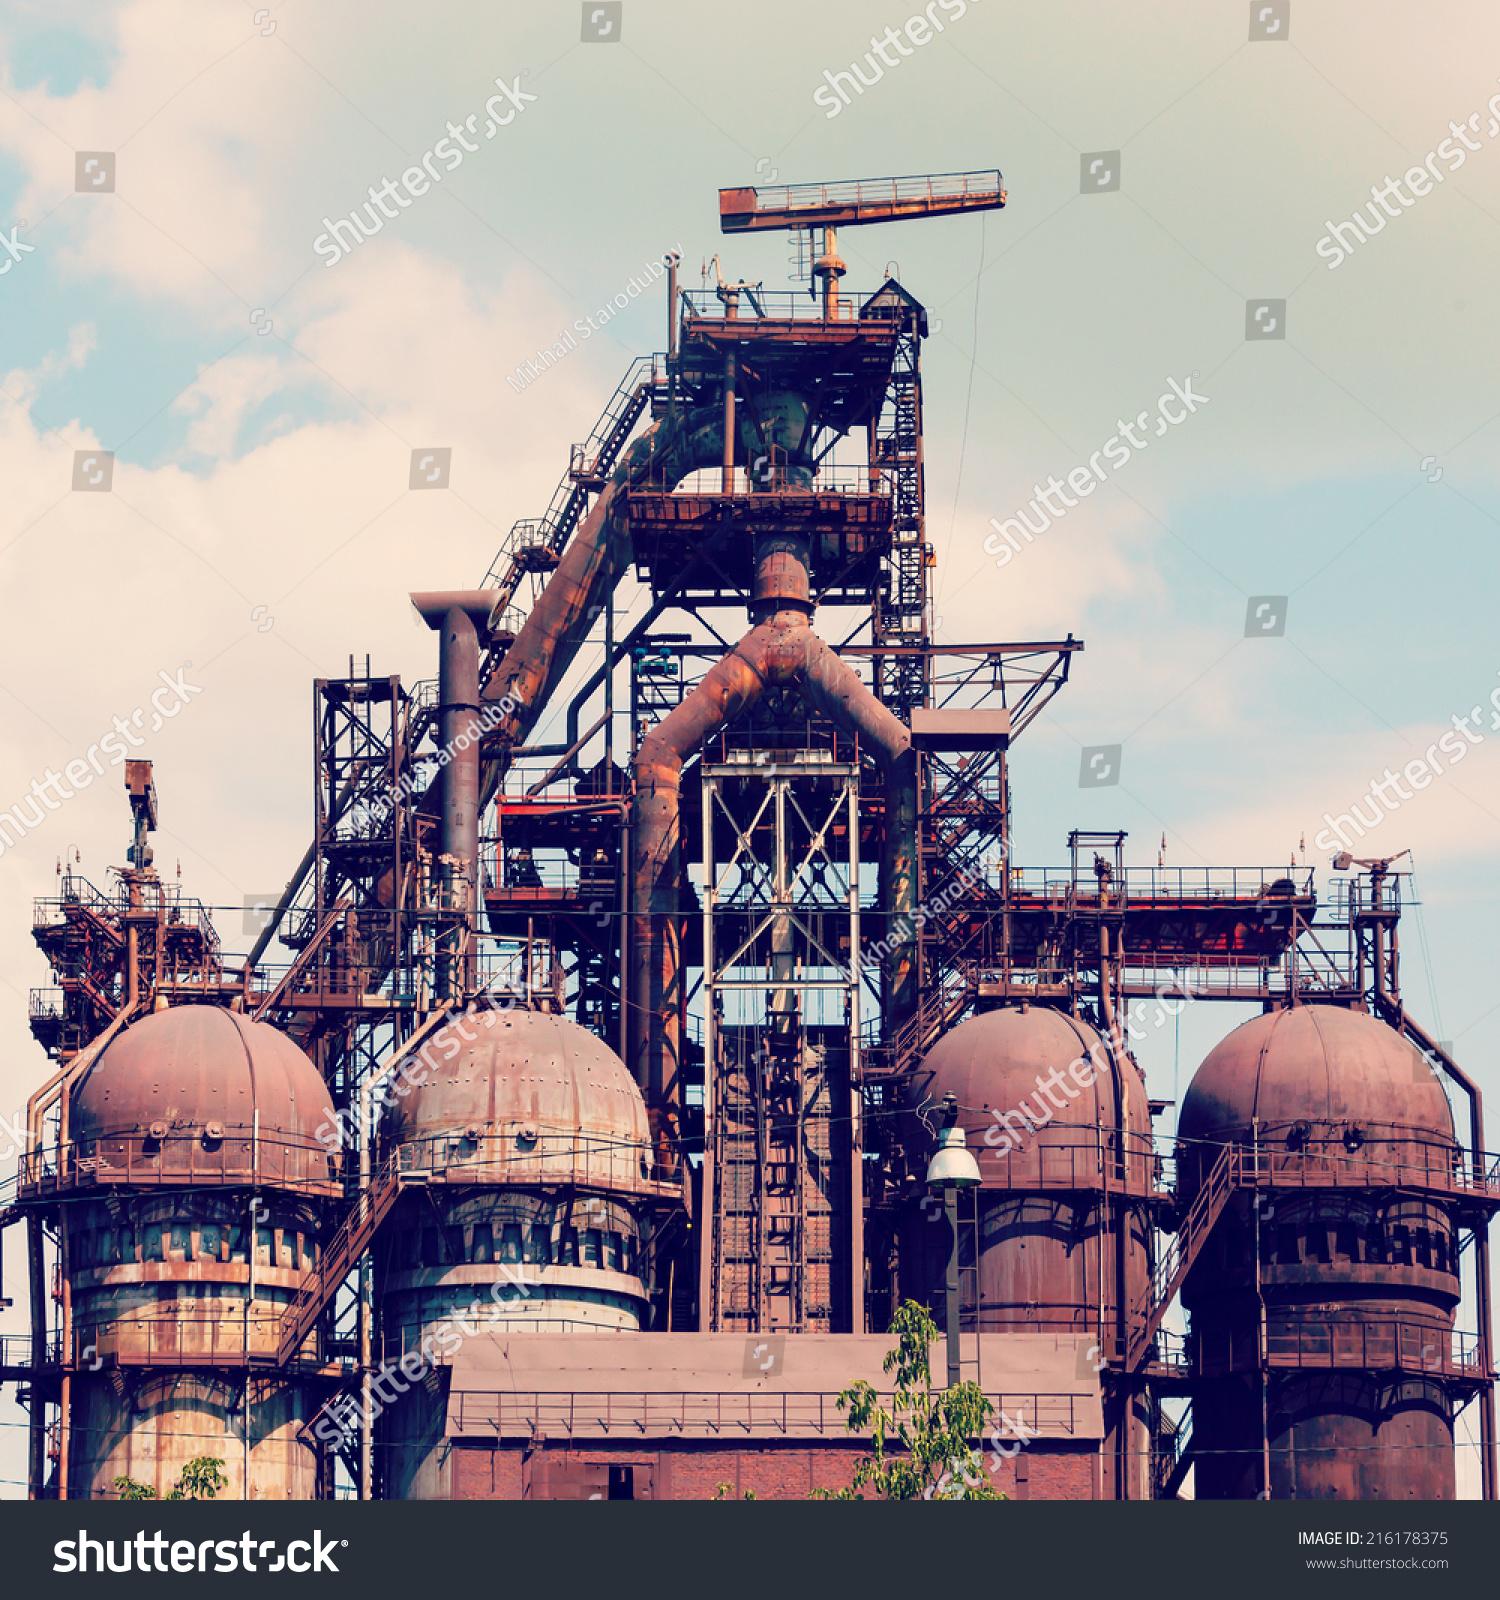 building blast furnace steel industry on stock photo 216178375